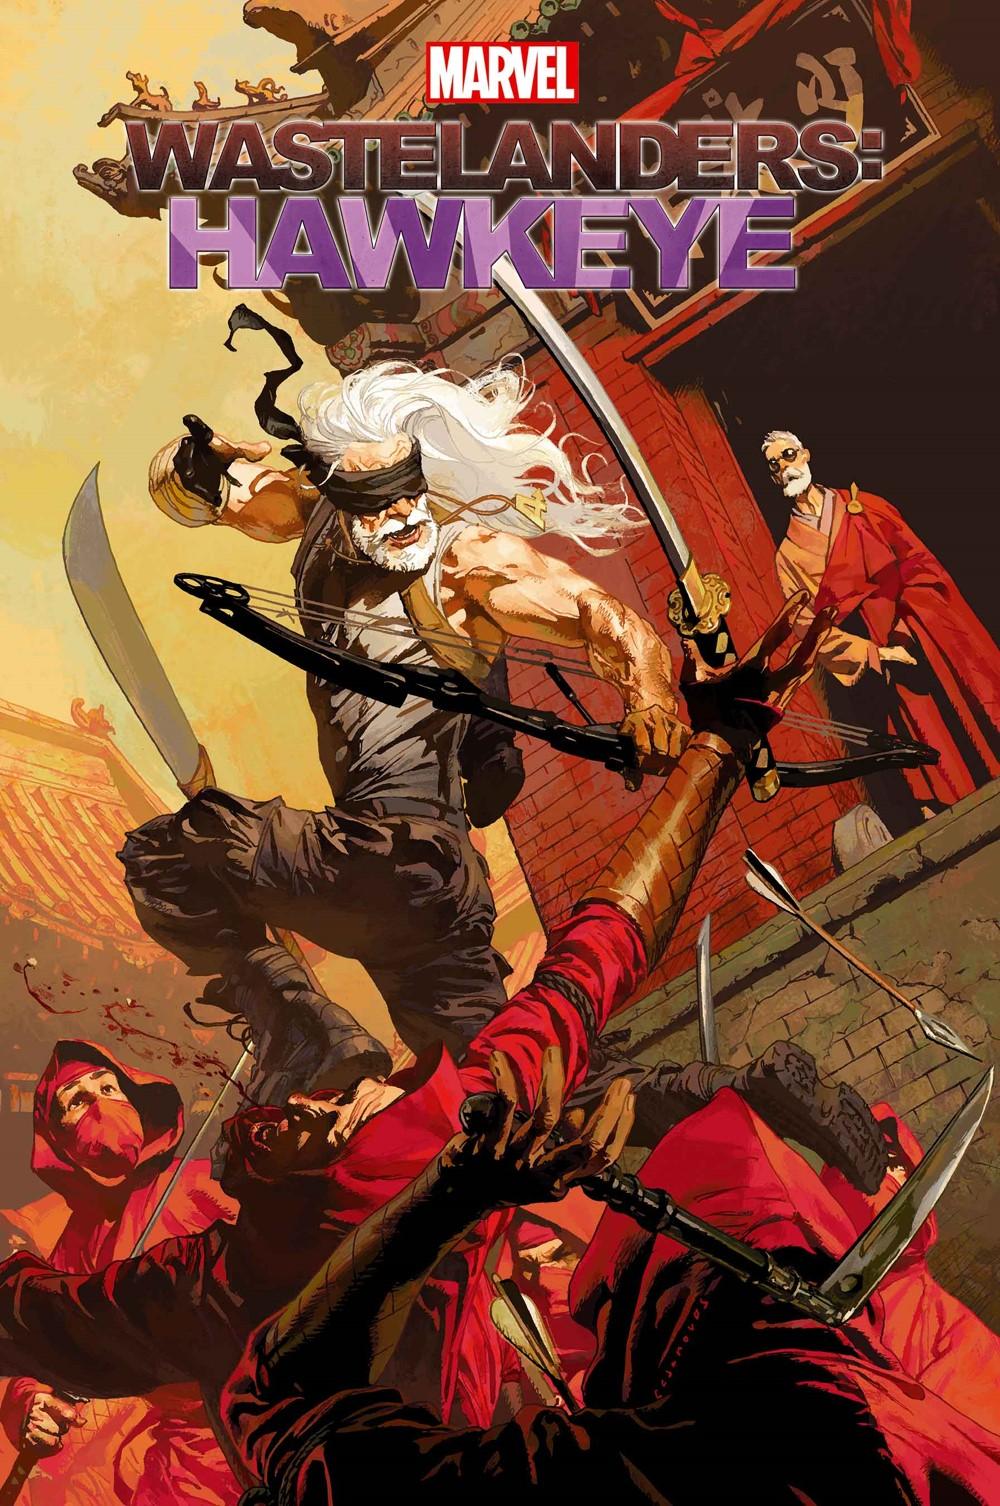 WASTELHAWKEYE2021001 Marvel Comics December 2021 Solicitations